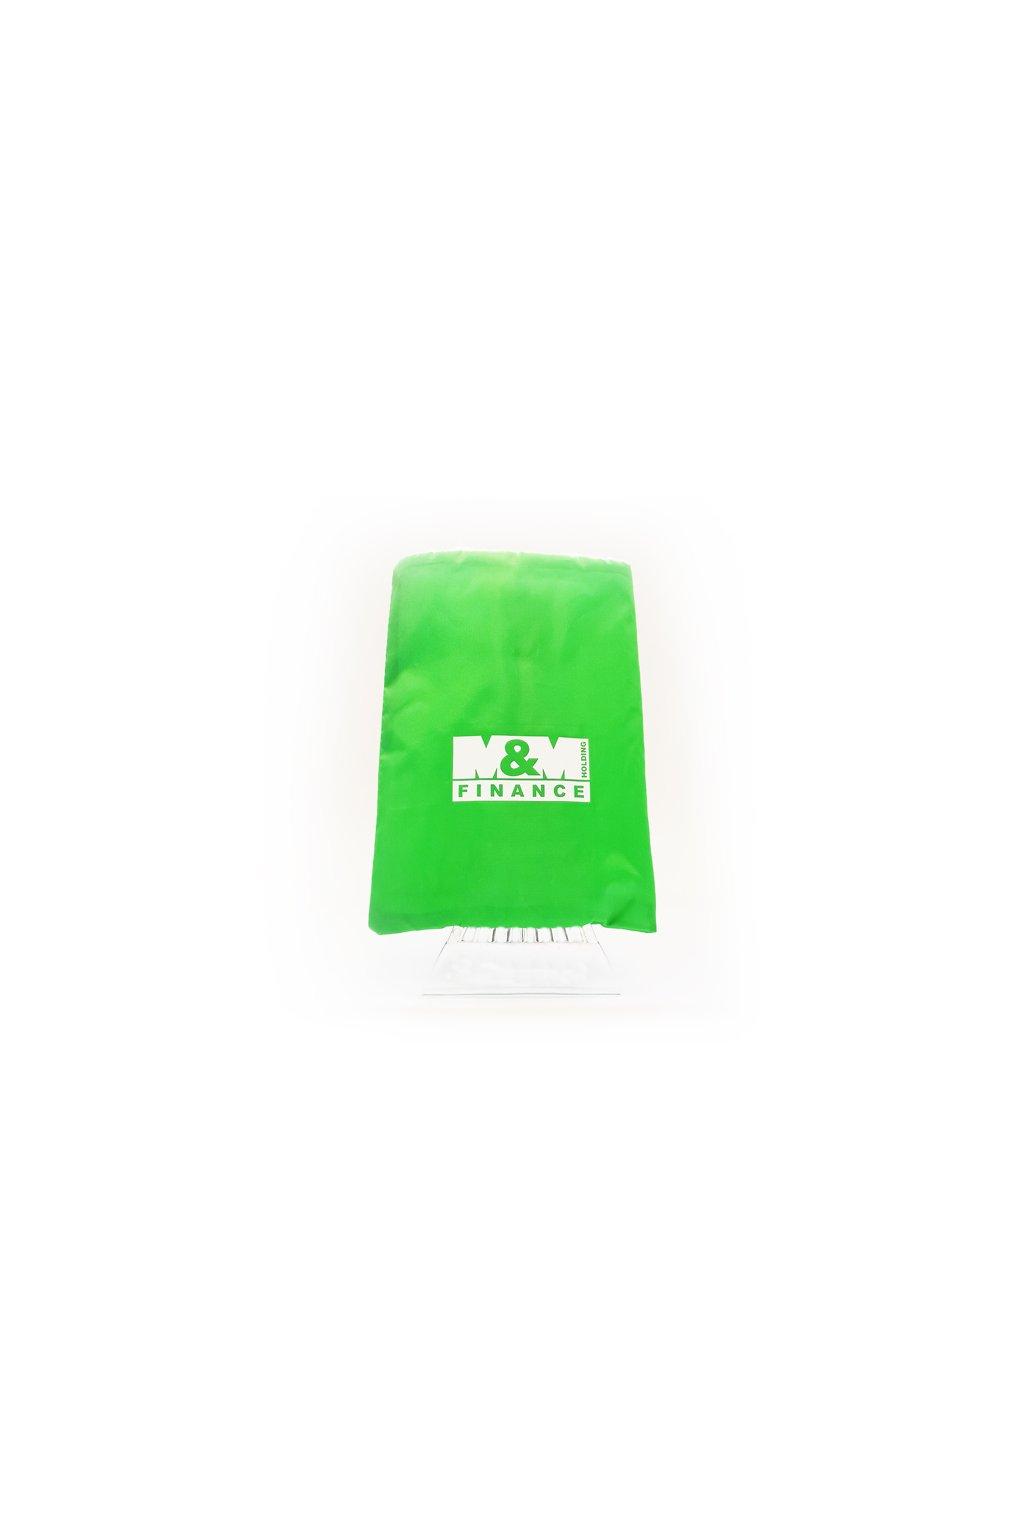 Škrabka na led - zelená M&M Finance